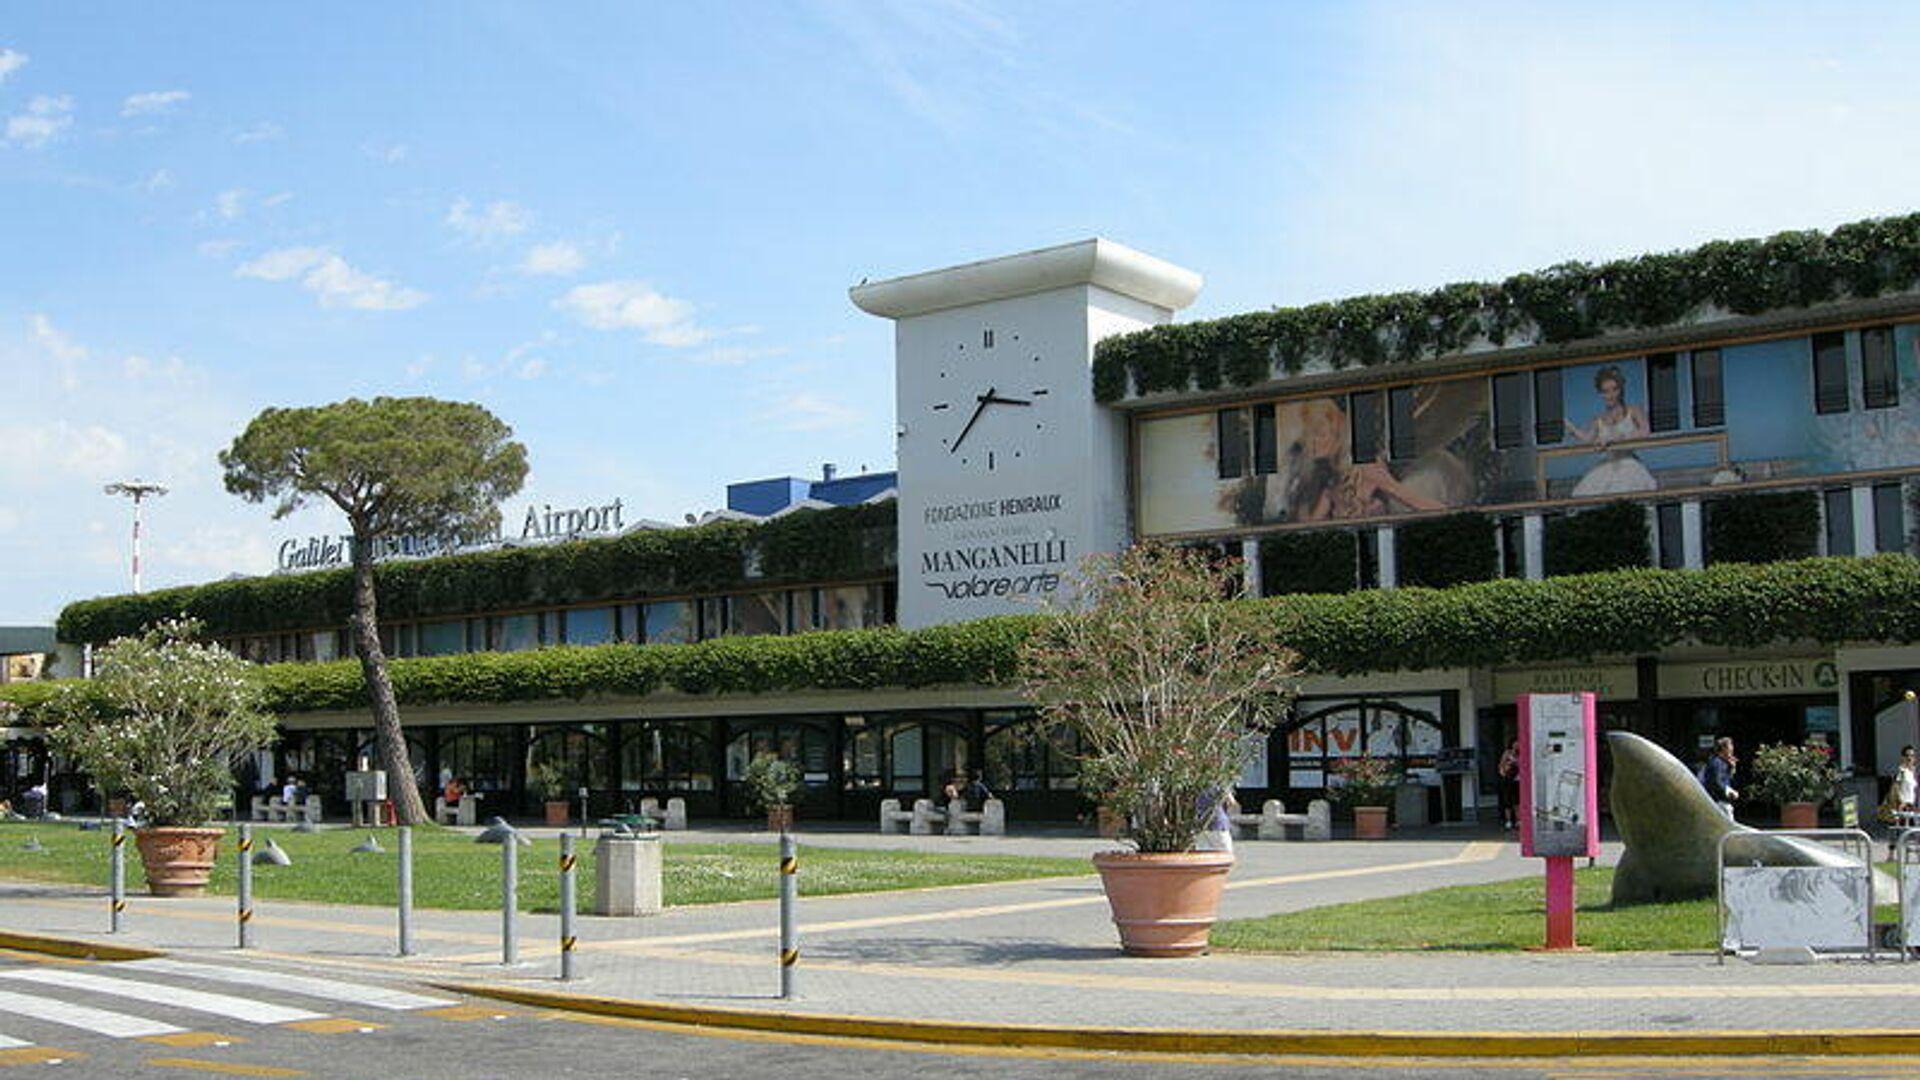 Aeroporto Internazionale Galileo Galilei, Pisa - Sputnik Italia, 1920, 12.06.2021